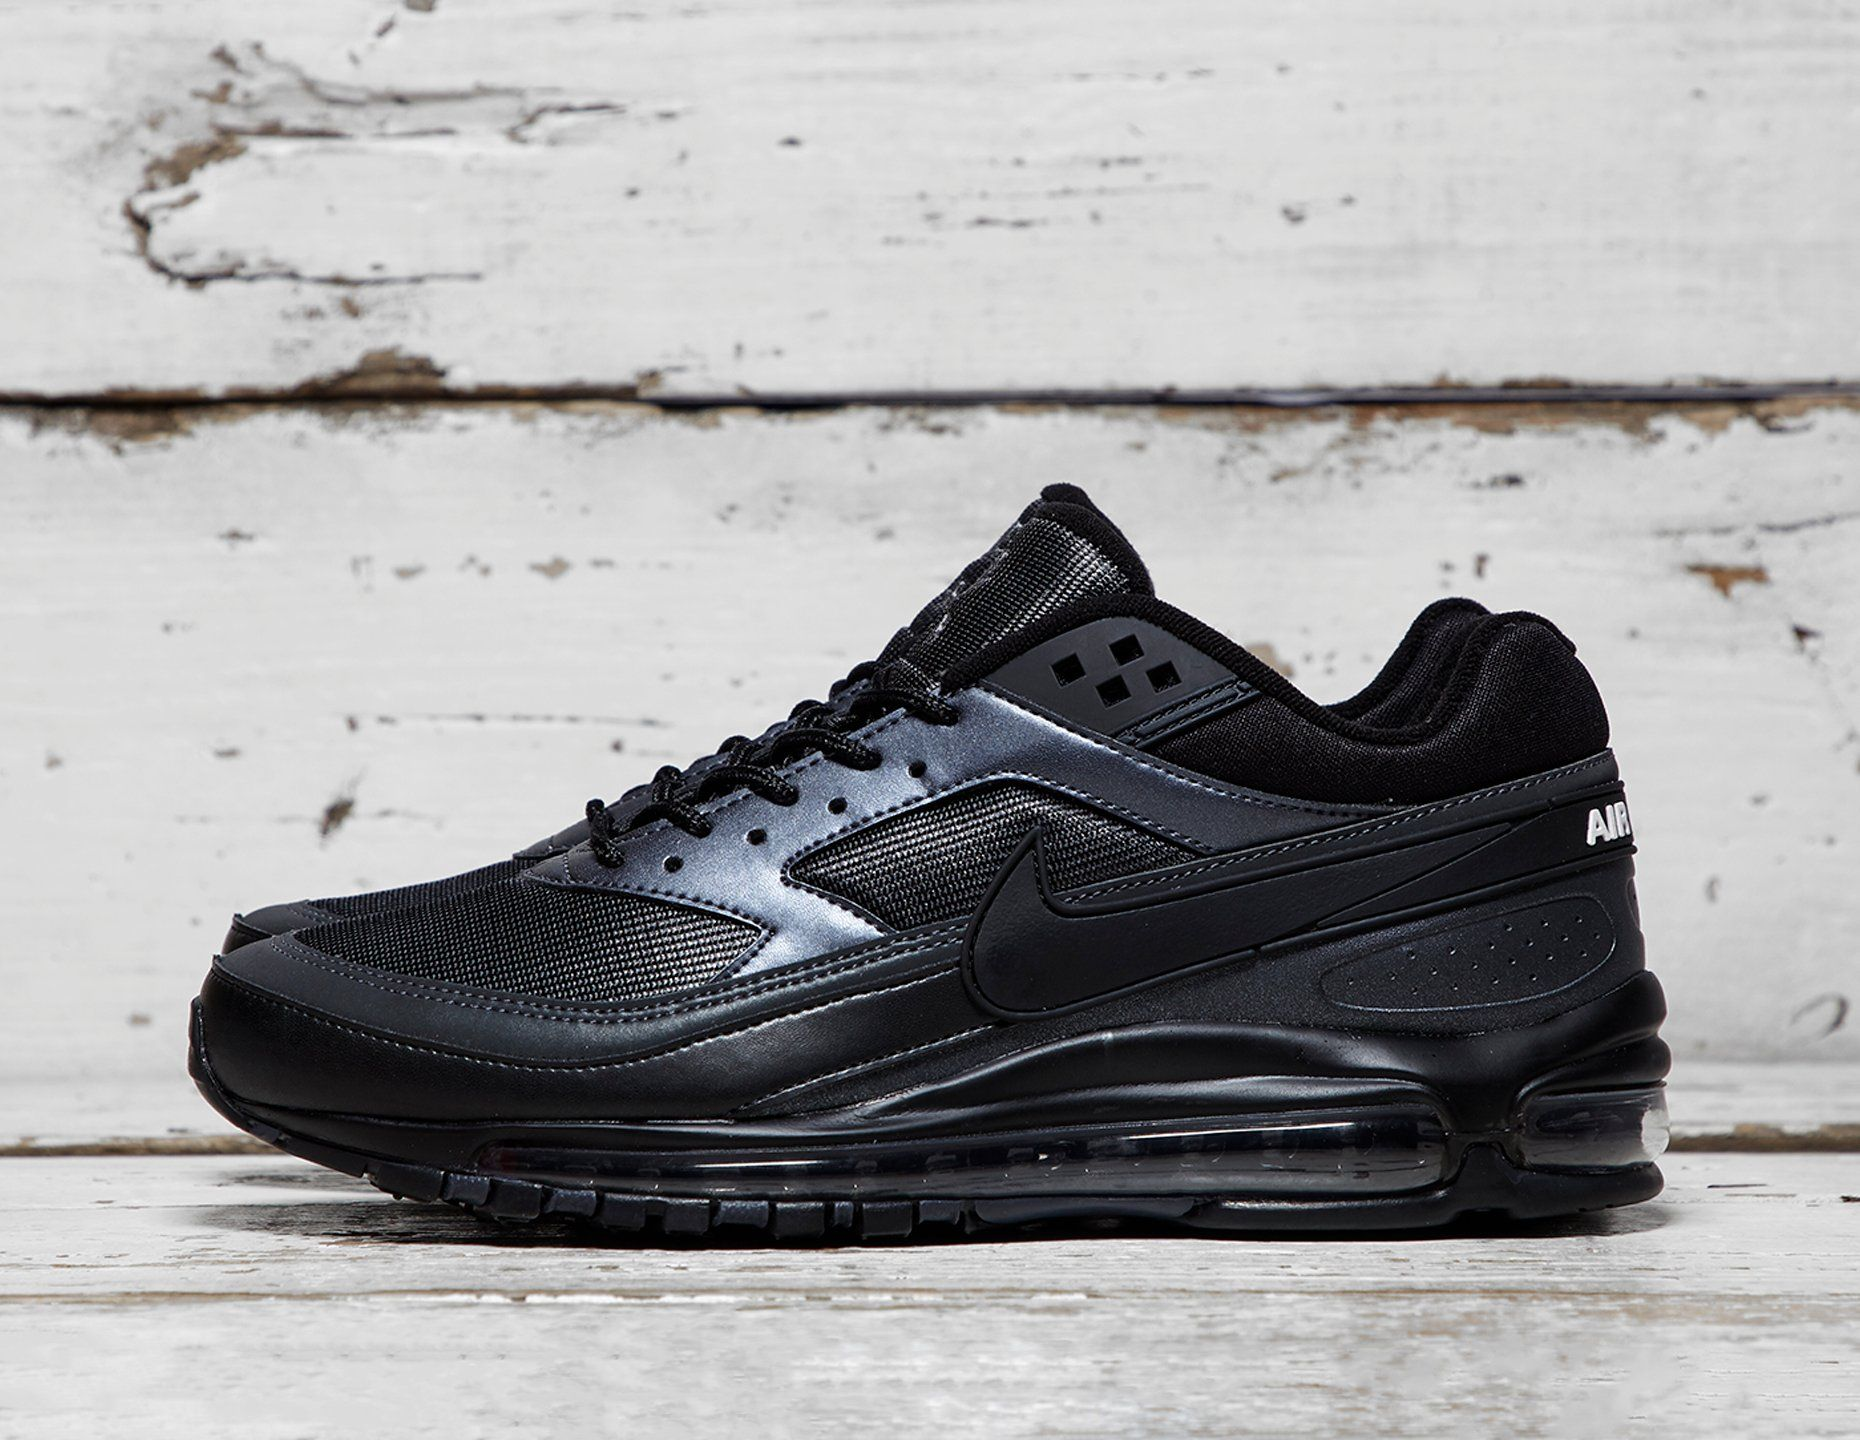 97b0046d781b25 Nike Air Max 97 BW